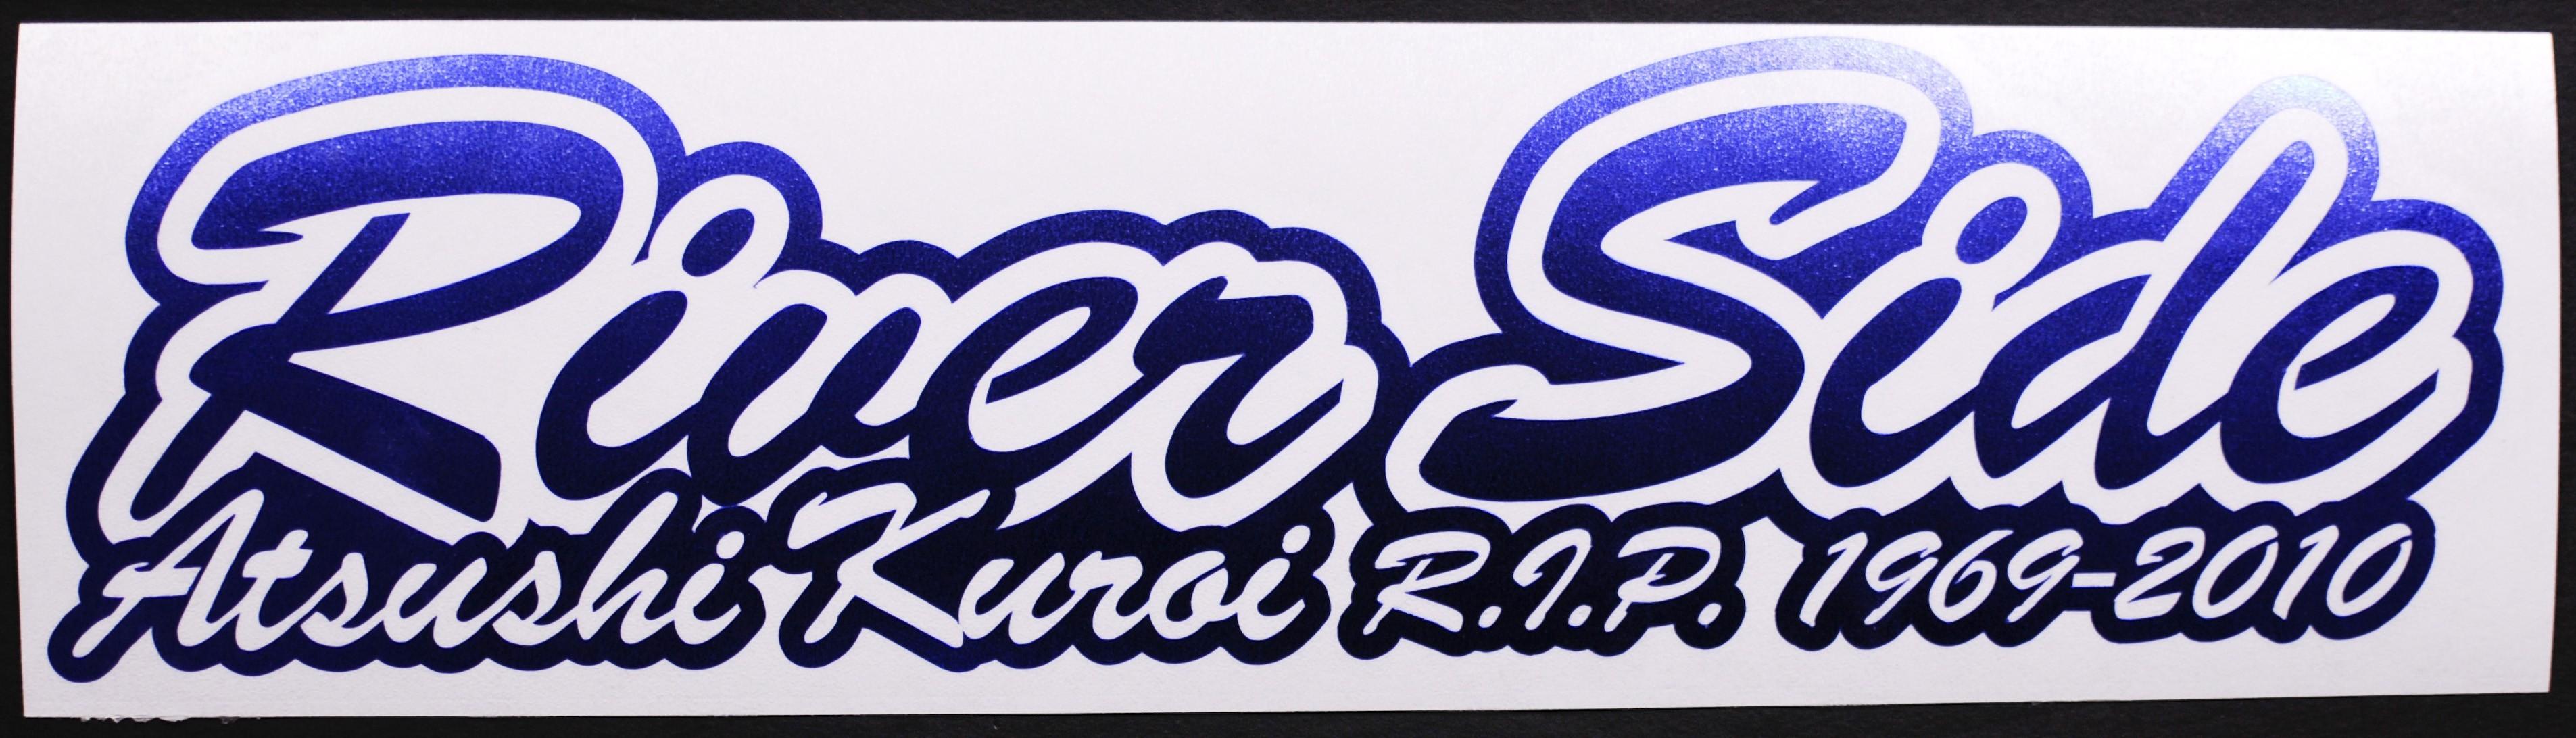 Kuroi River Side Tribute Sticker T Shirt Origin